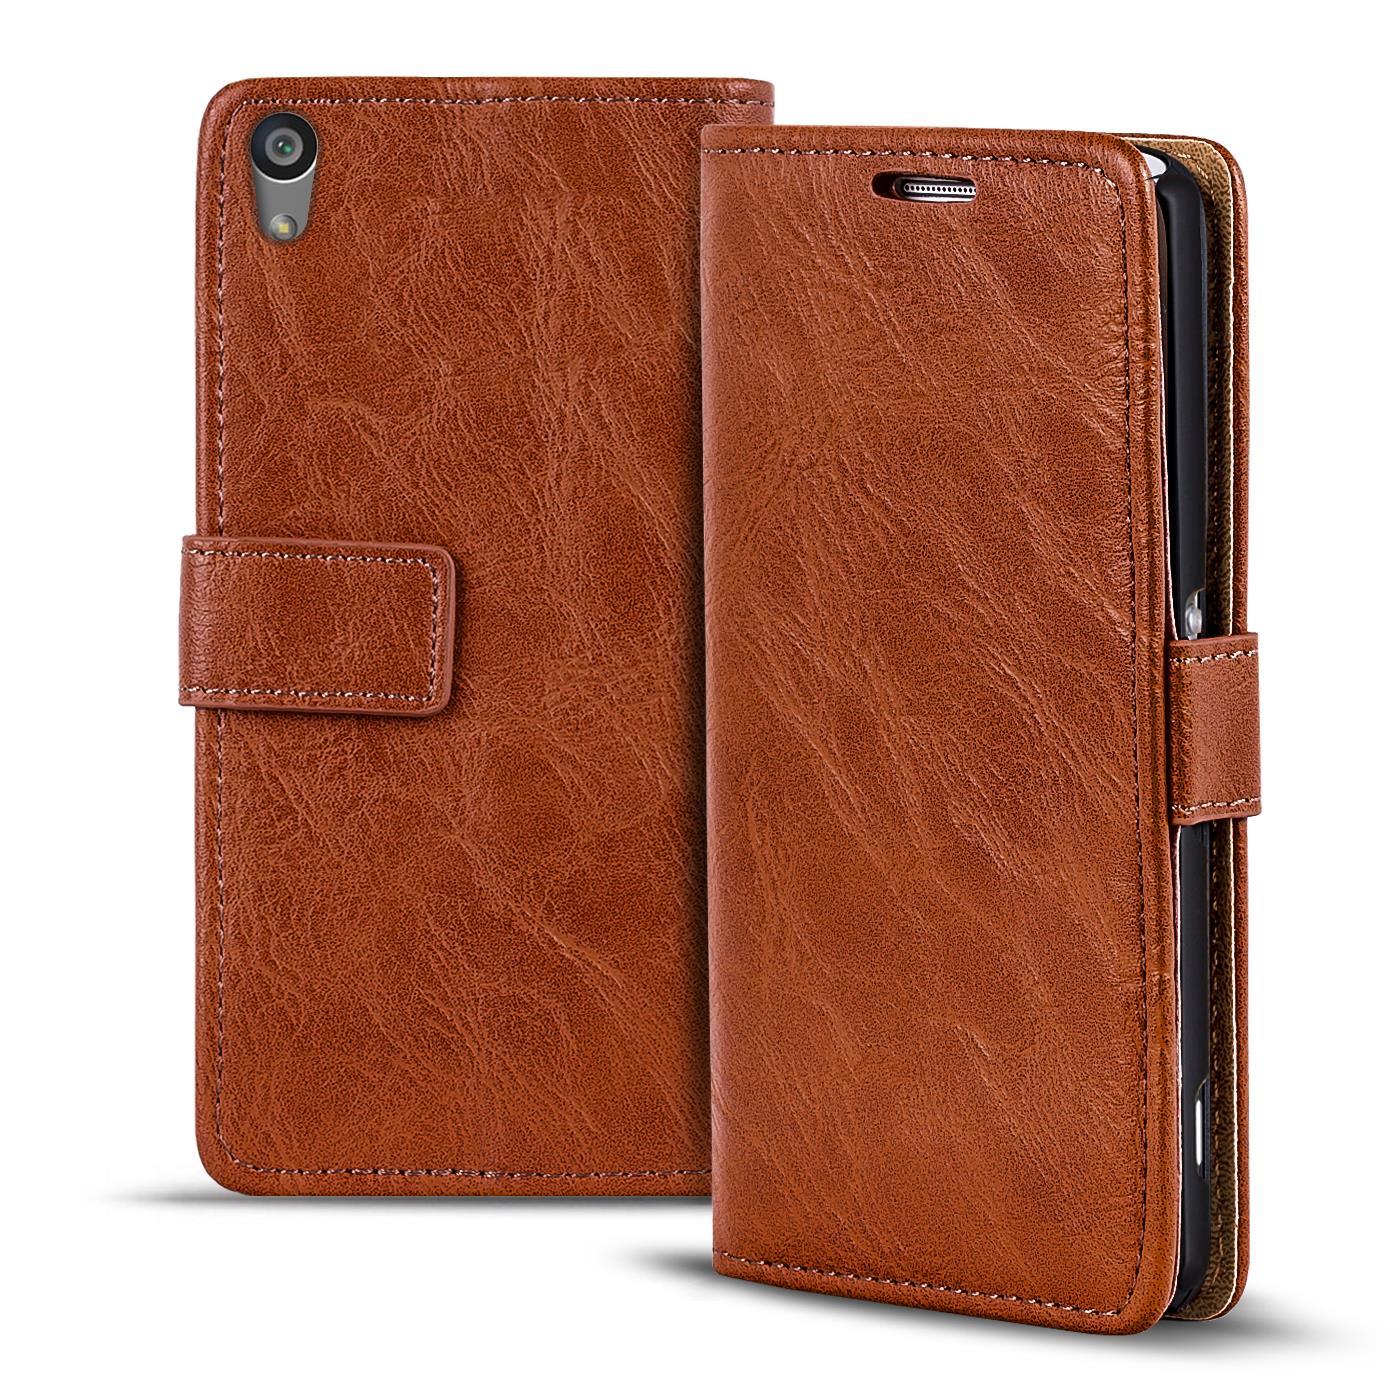 premium selection 2d1f6 9b253 Details about Pouch Sony Xperia Z2 Flip Cover Case Case Wallet